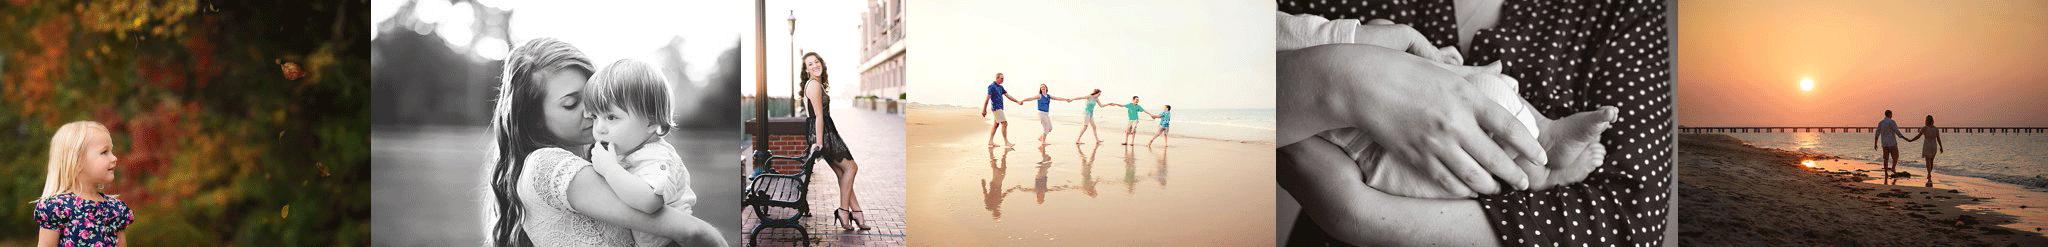 virginia-beach-norfolk-portsmouth-chesapeake-sandbridge-family-newborn-child-engagement-wedding-photographer-melissa-bliss-photography